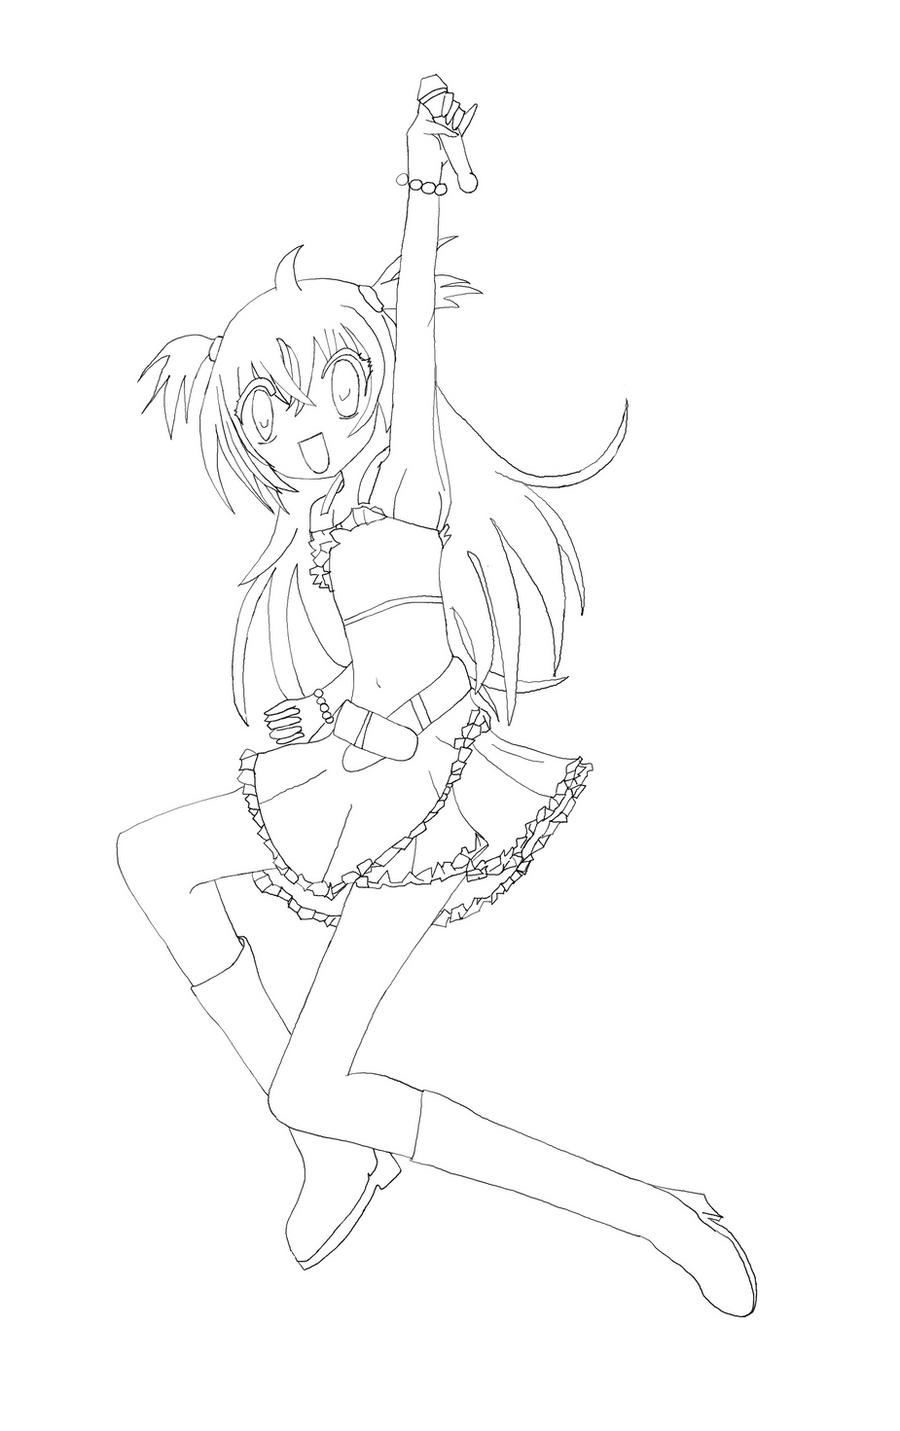 Kilari lineart by crazy over anime on deviantart - Kilari dessin ...